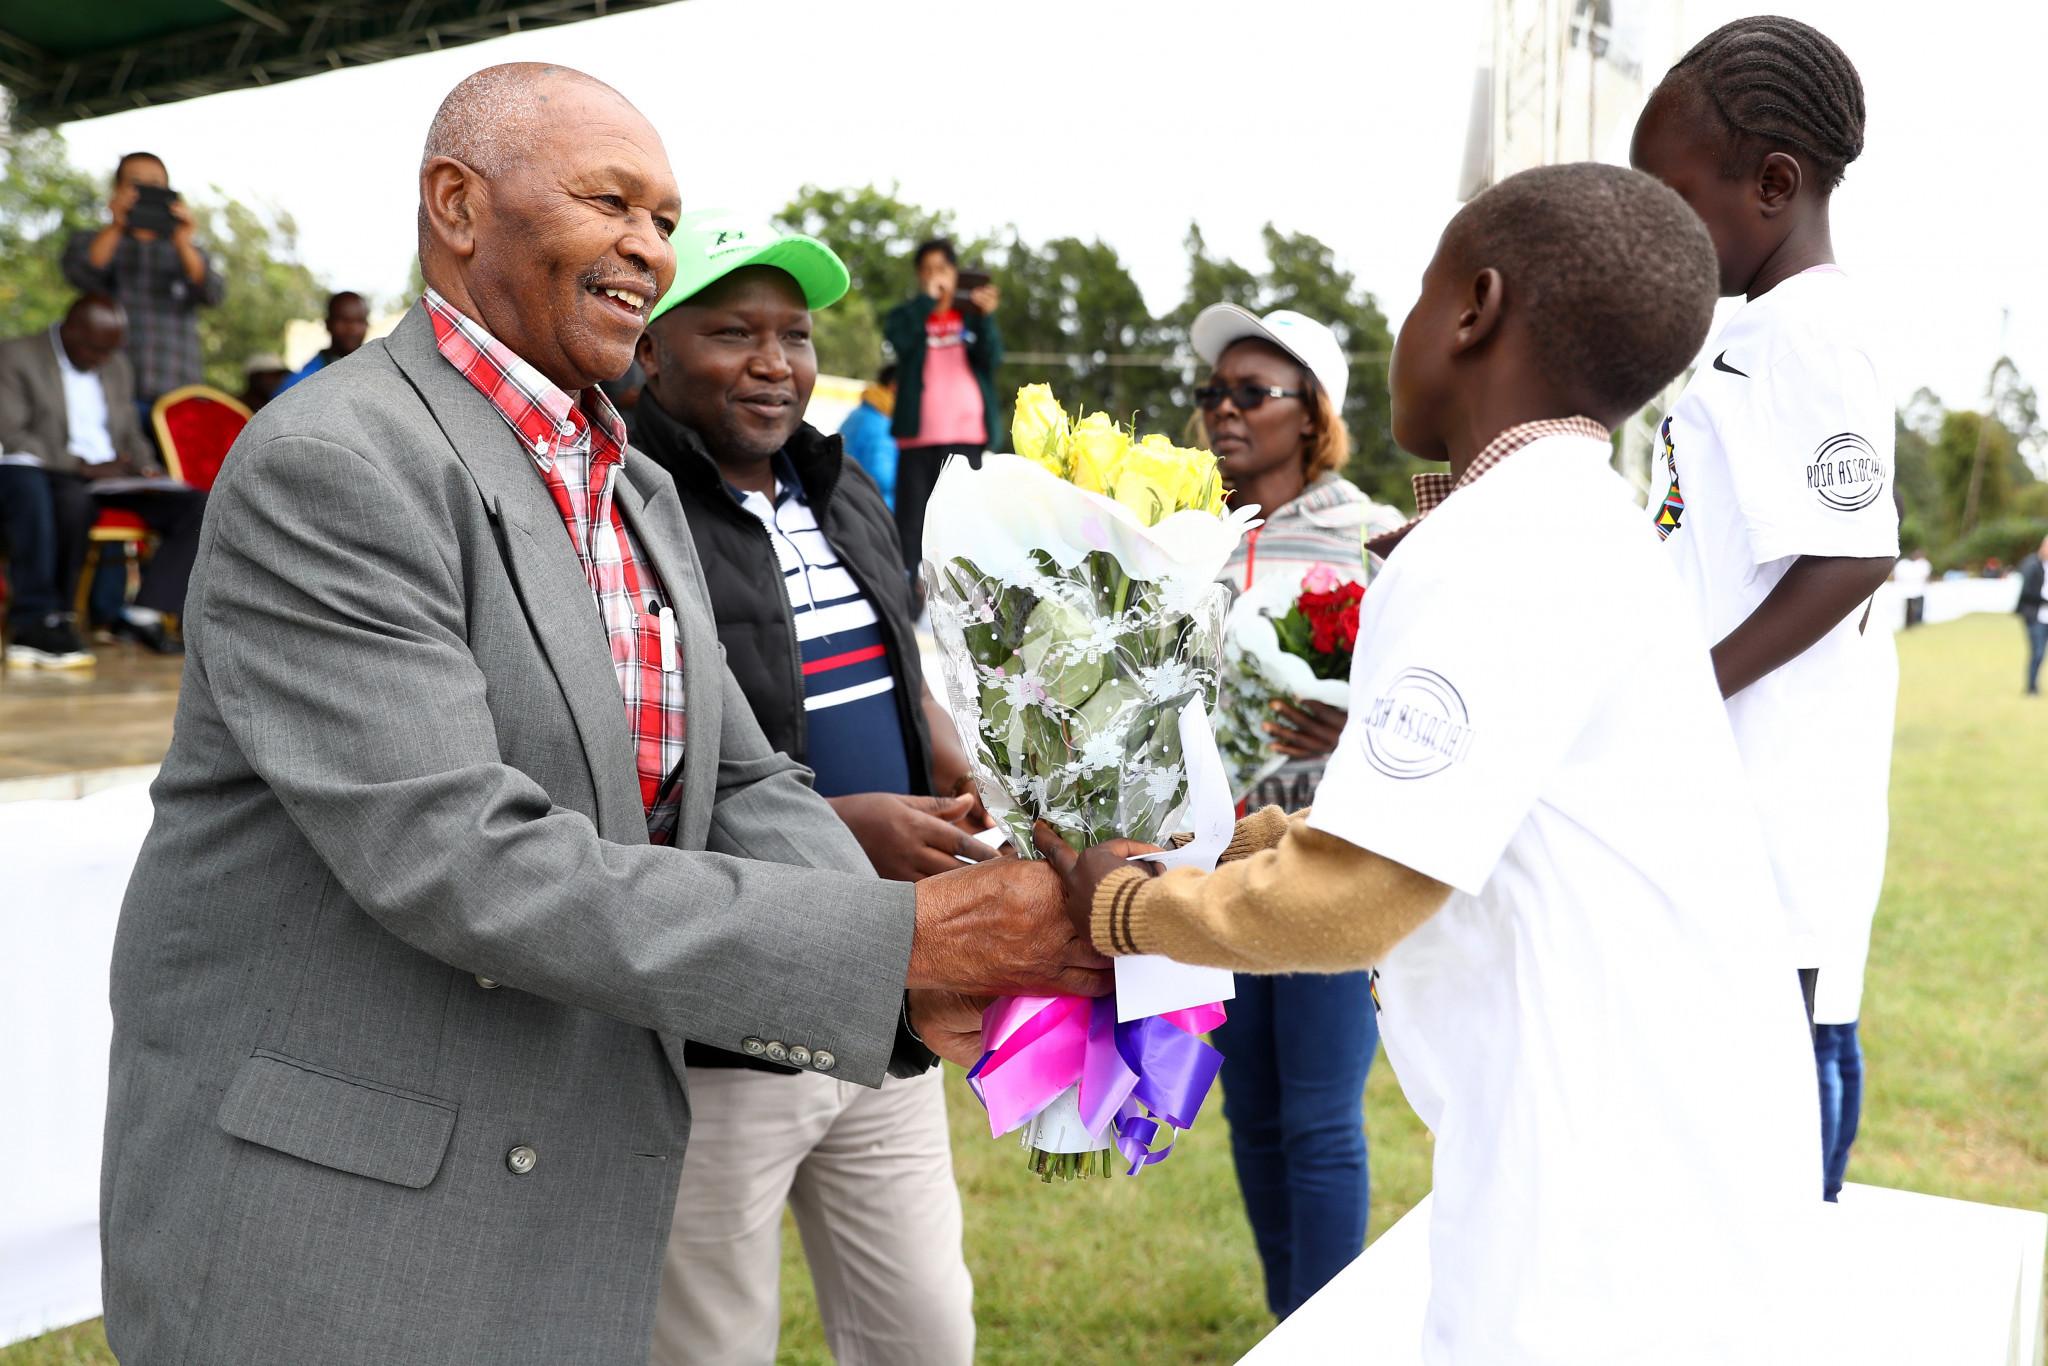 Nairobi Continental Tour event to be named Kipchoge Keino Classic